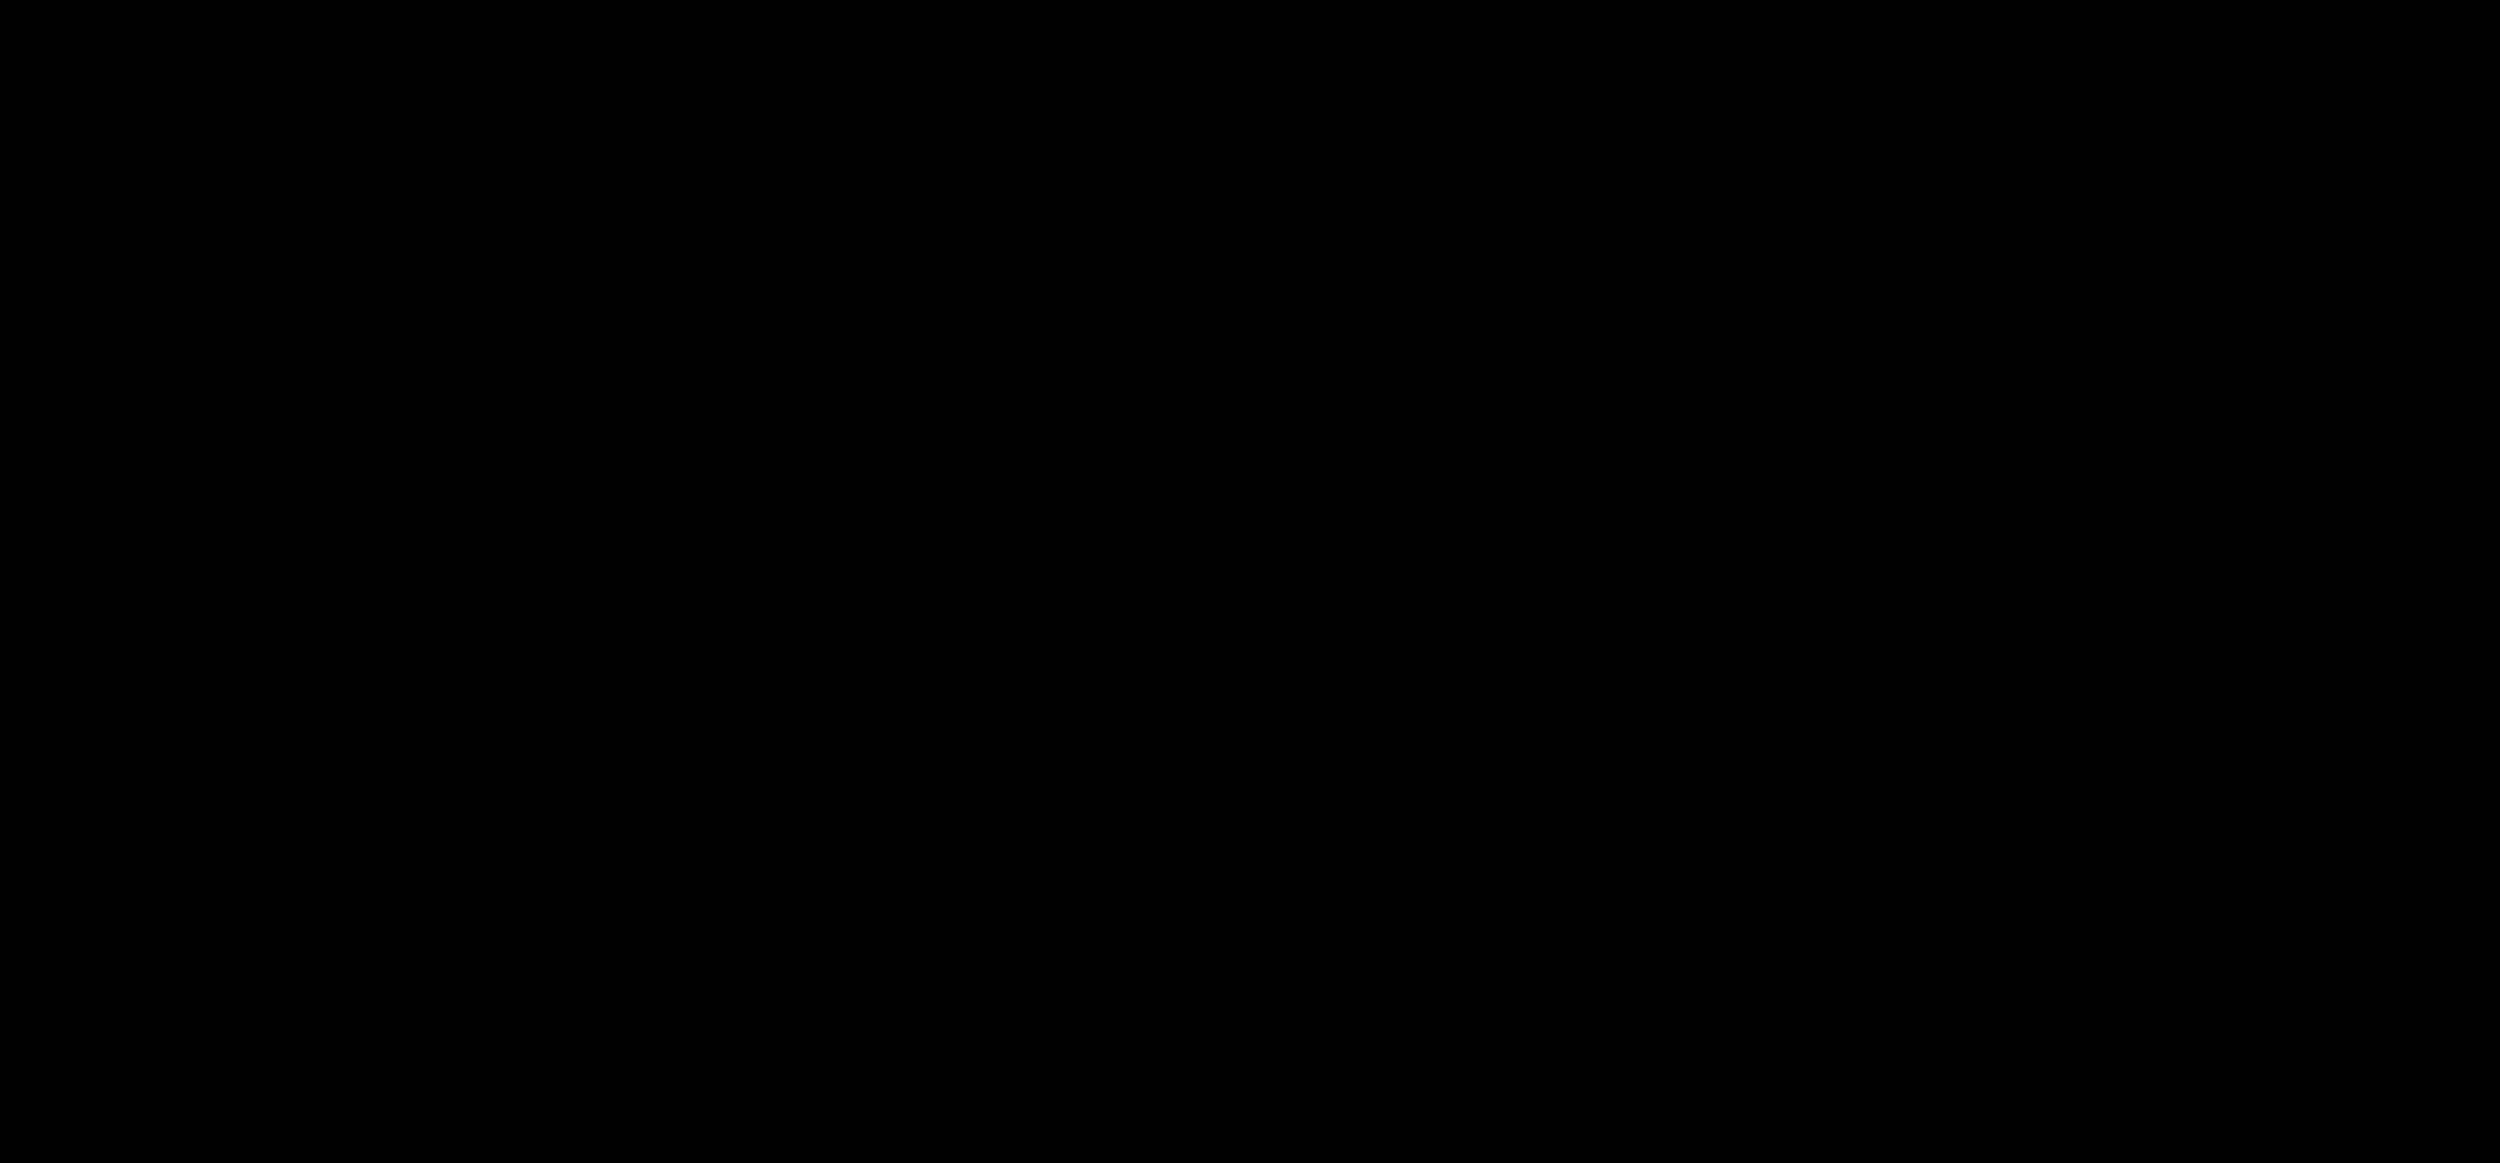 AJCC_Horizontal_Logo_Black.png